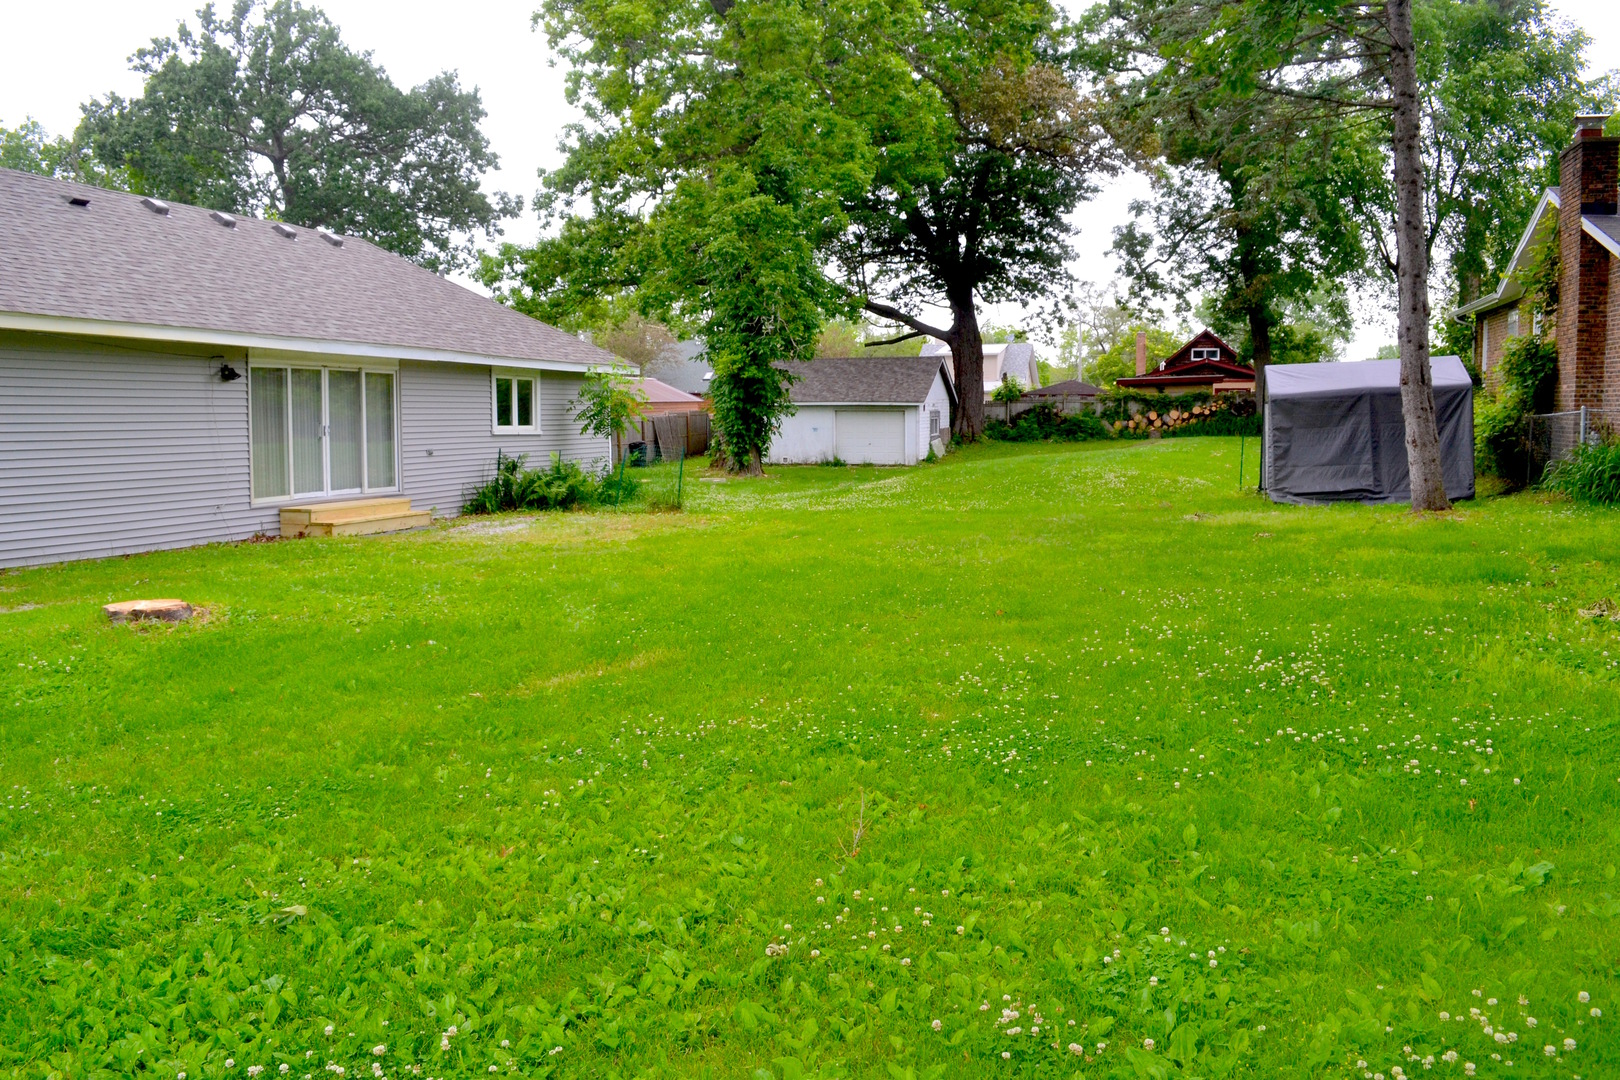 26372 West Grapevine, ANTIOCH, Illinois, 60002